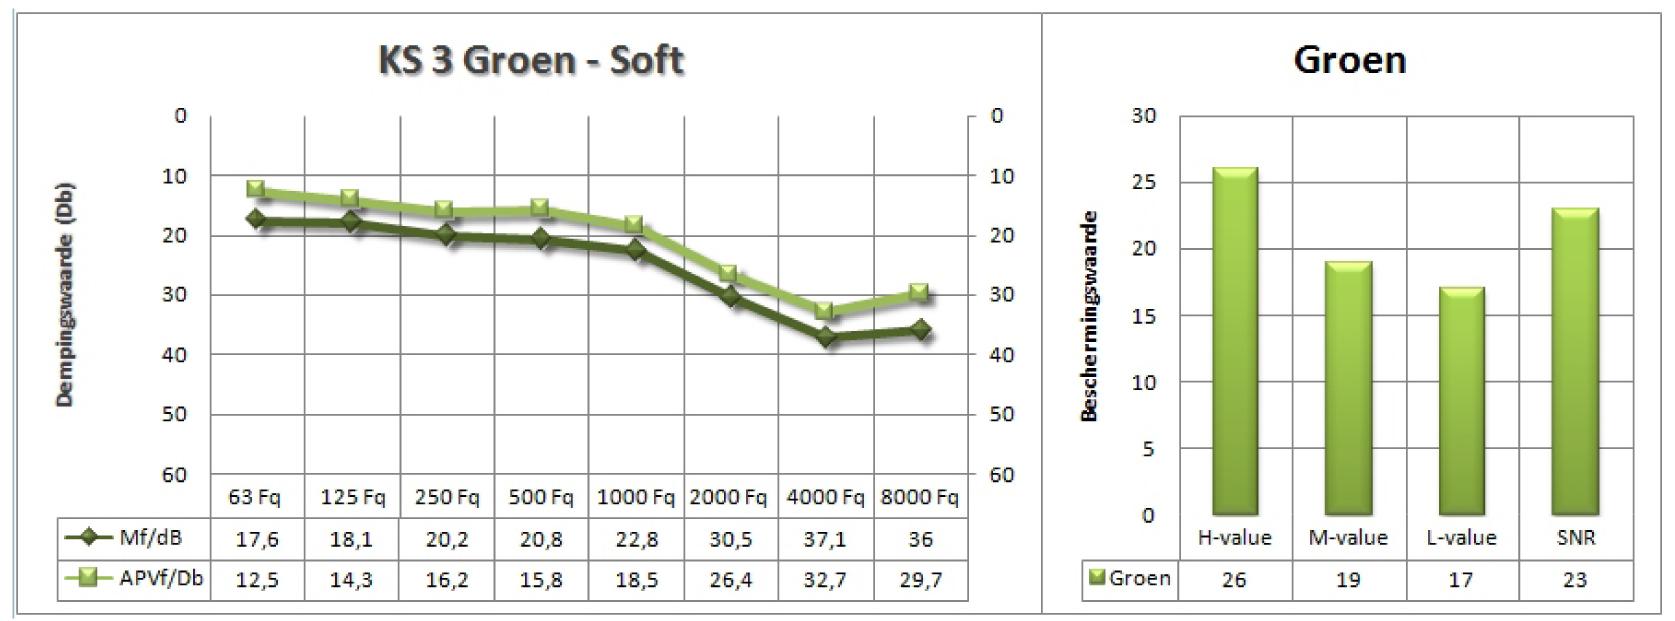 dempingswaarden ks3 groen